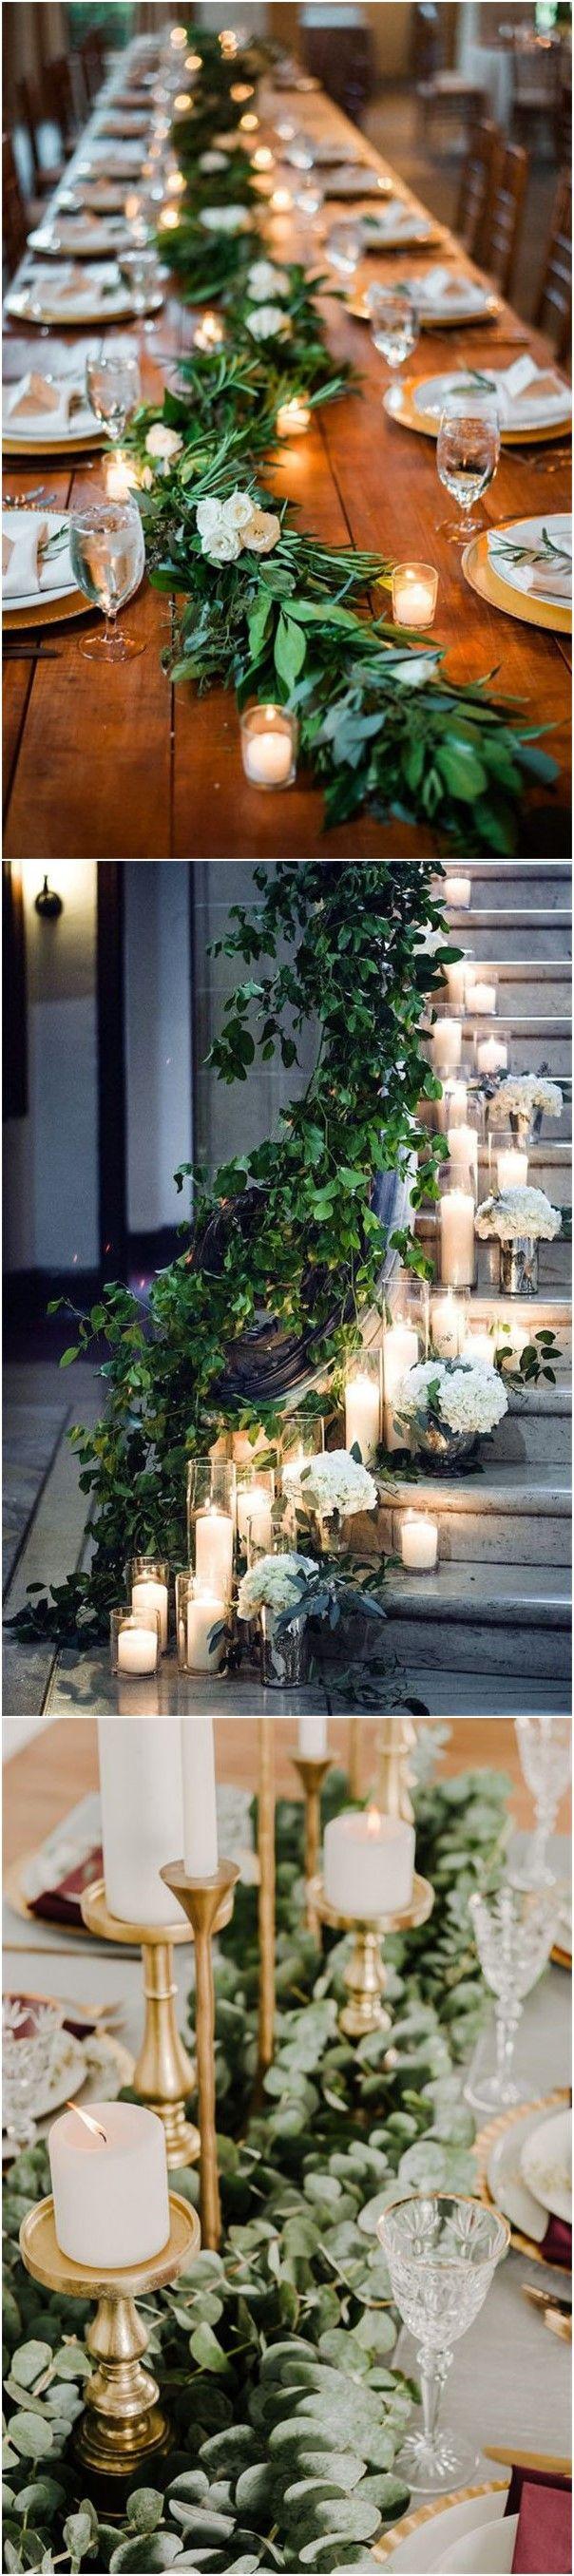 Wedding room decoration ideas 2018   Stuning Wedding Candlelight Decoration Ideas You Will Love